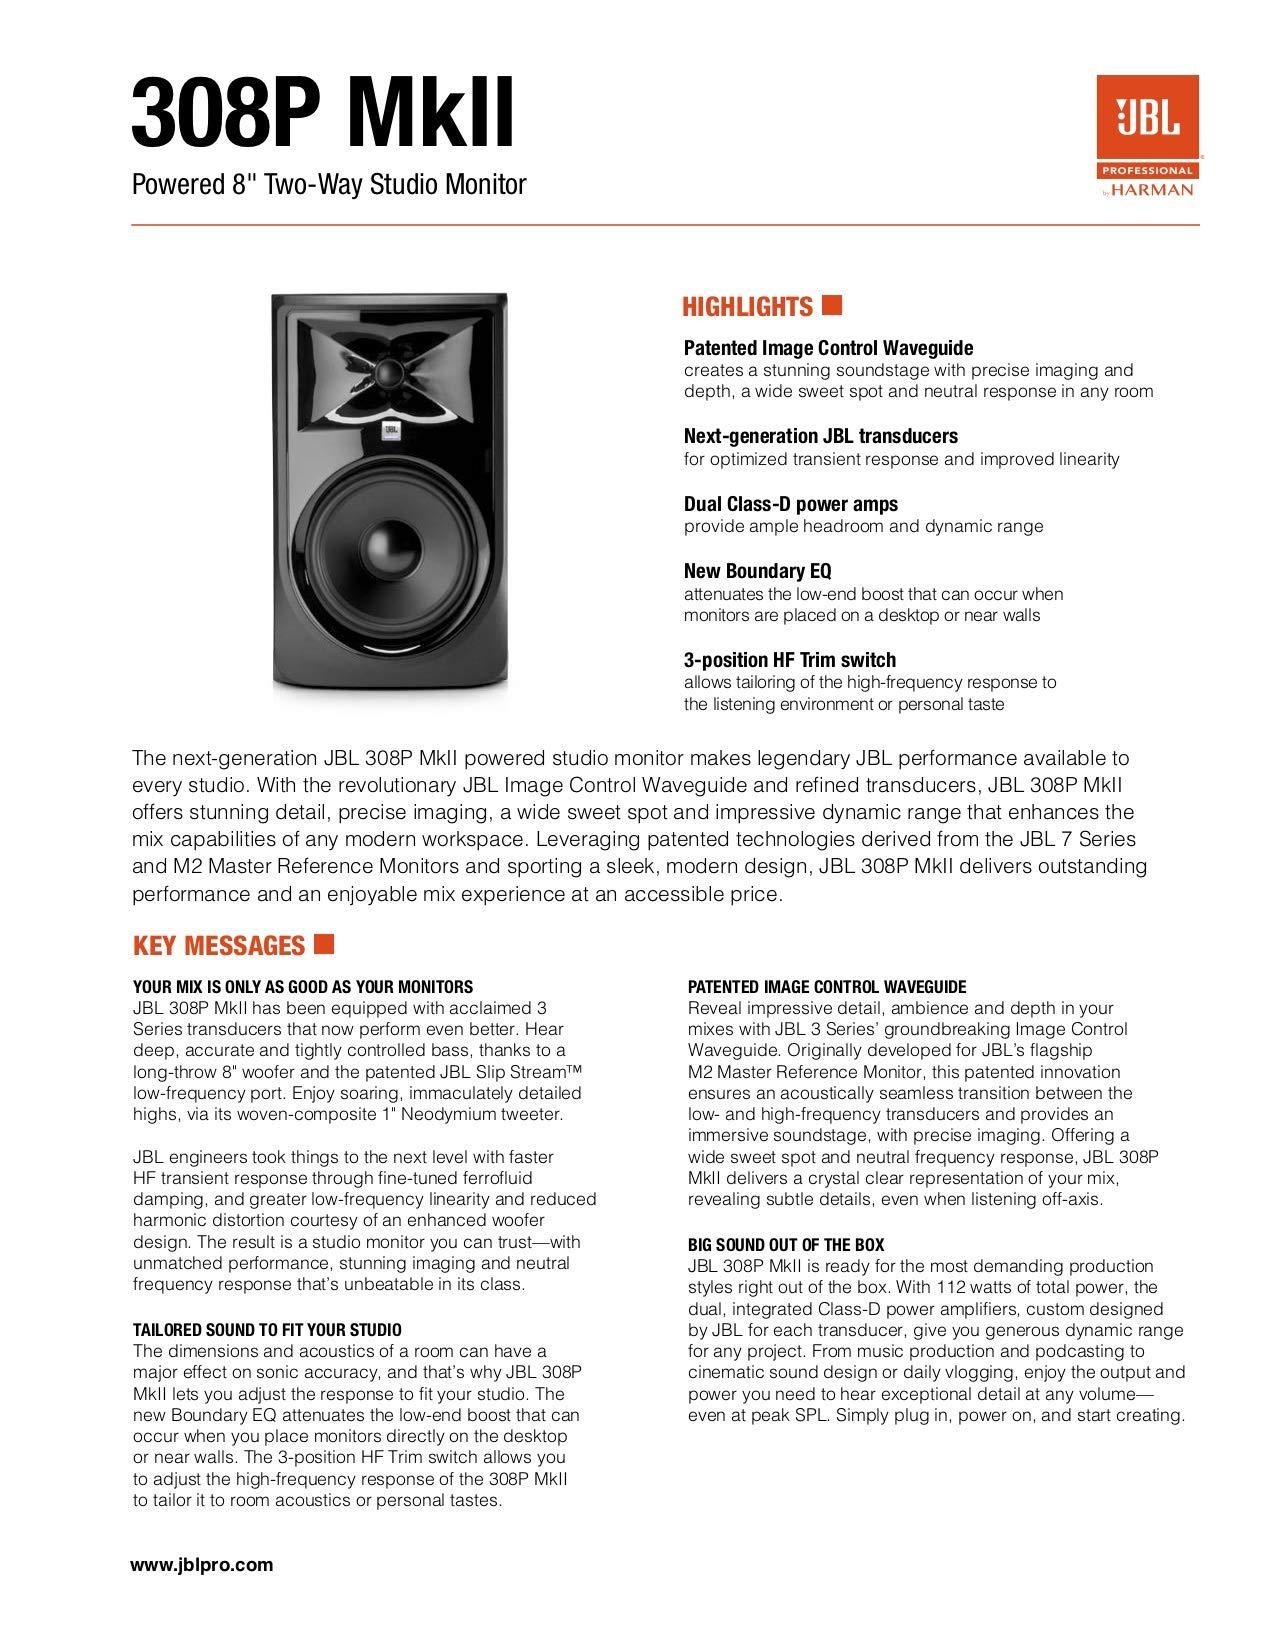 JBL 306P MkII 6'' 2-Way Powered Studio Monitor (new model) by JBL Professional (Image #10)